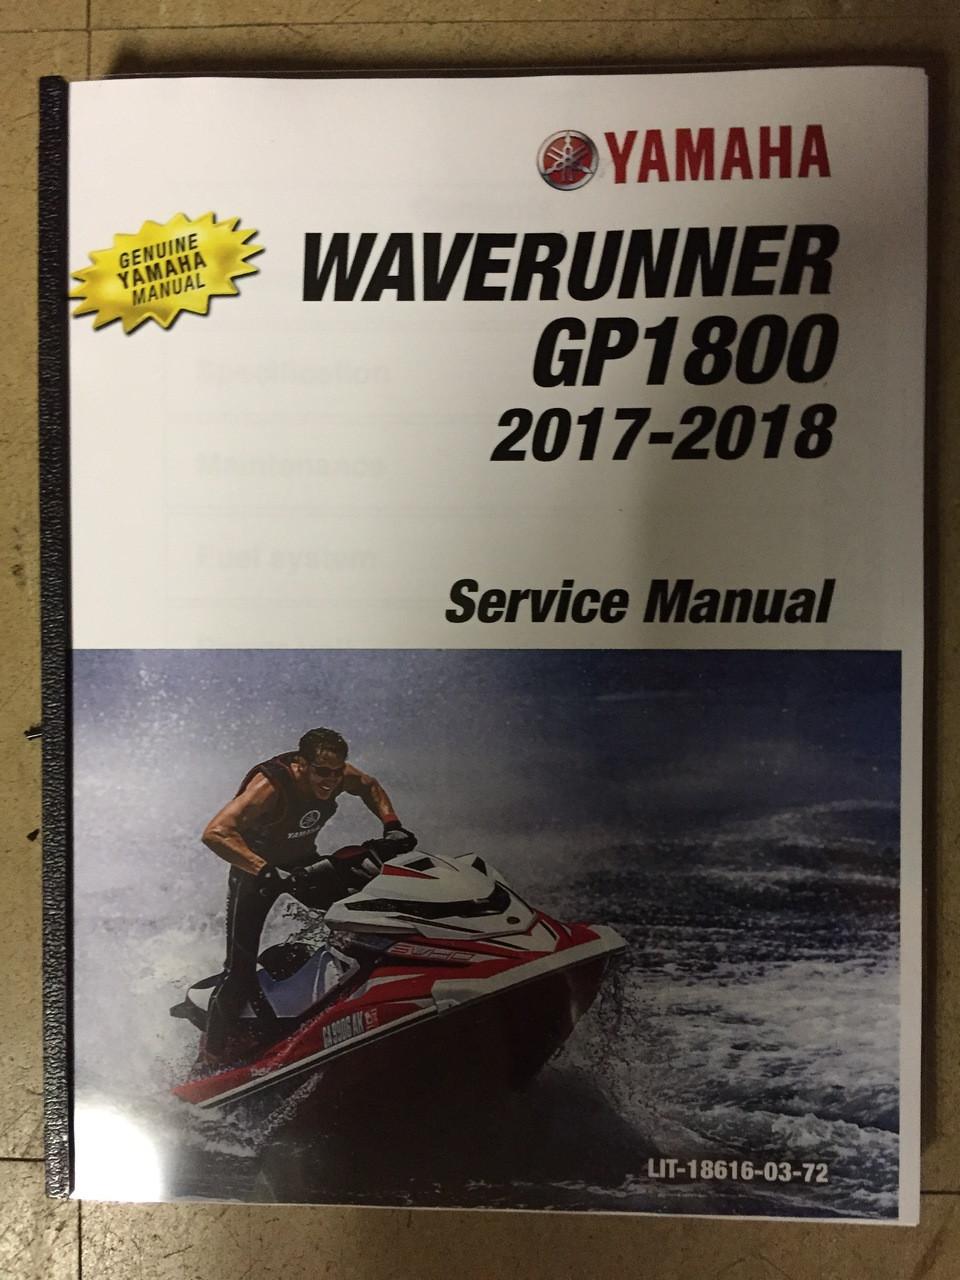 2017-2018 Yamaha Wave Runner GP1800 Part# LIT-18616-03-72 service shop  repair manual